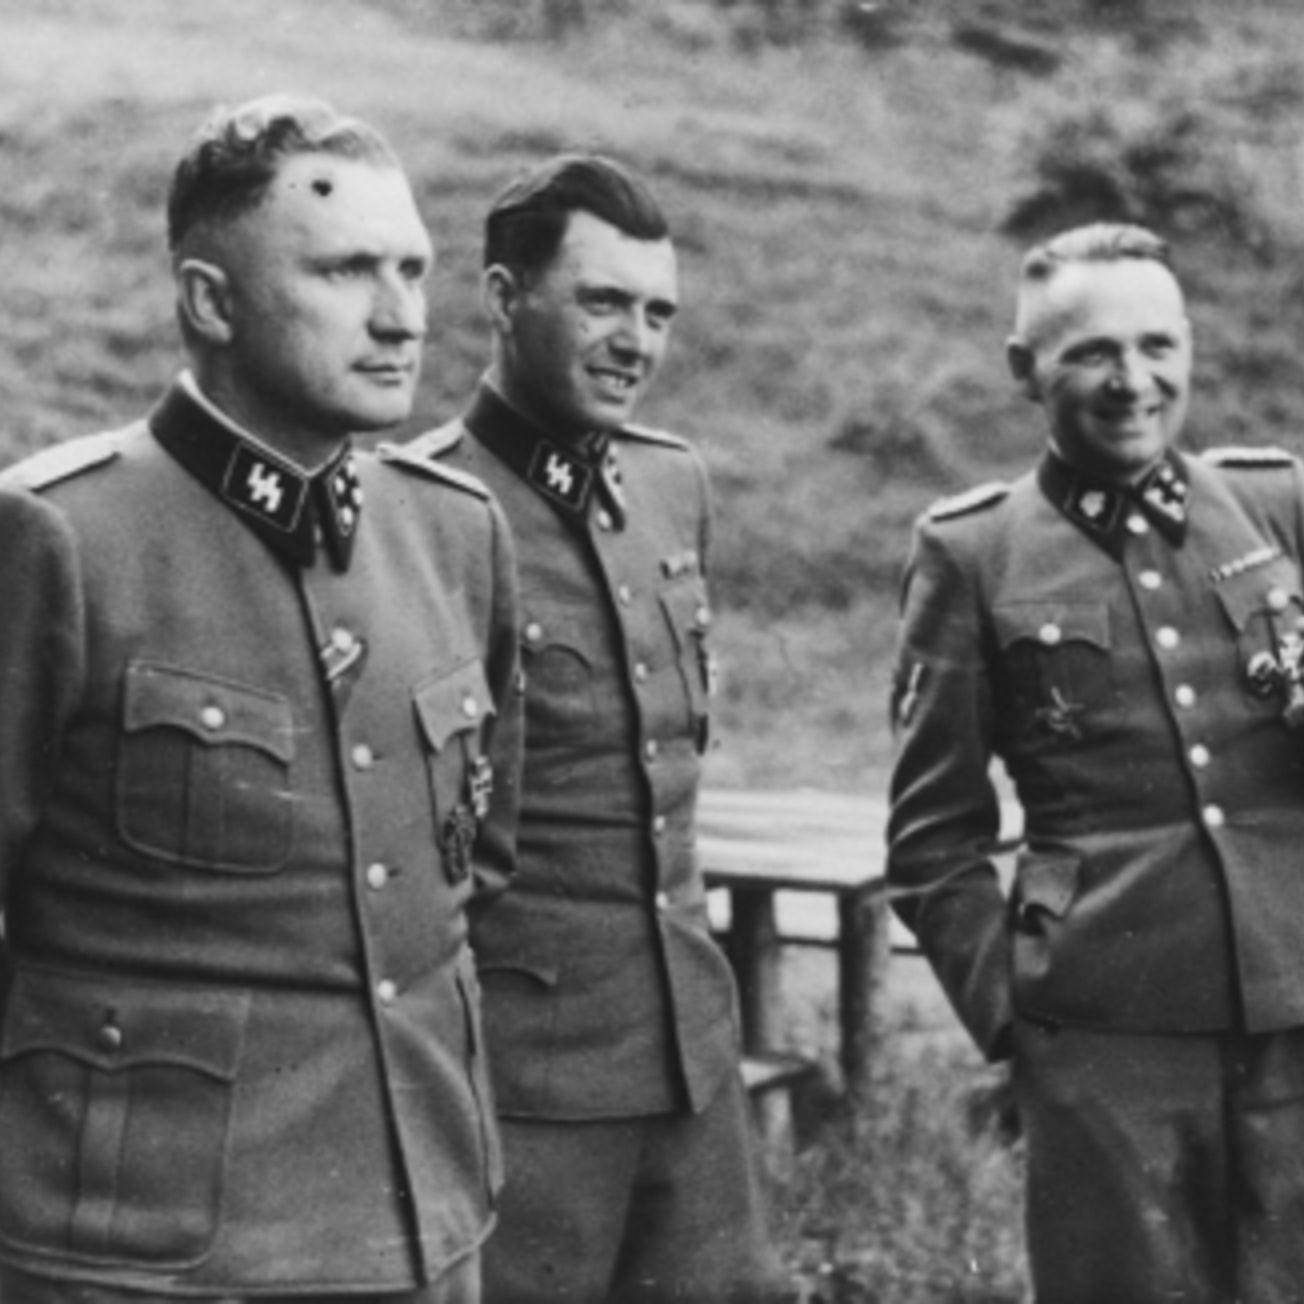 A Biography of Notorious Auschwitz Doctor Josef Mengele